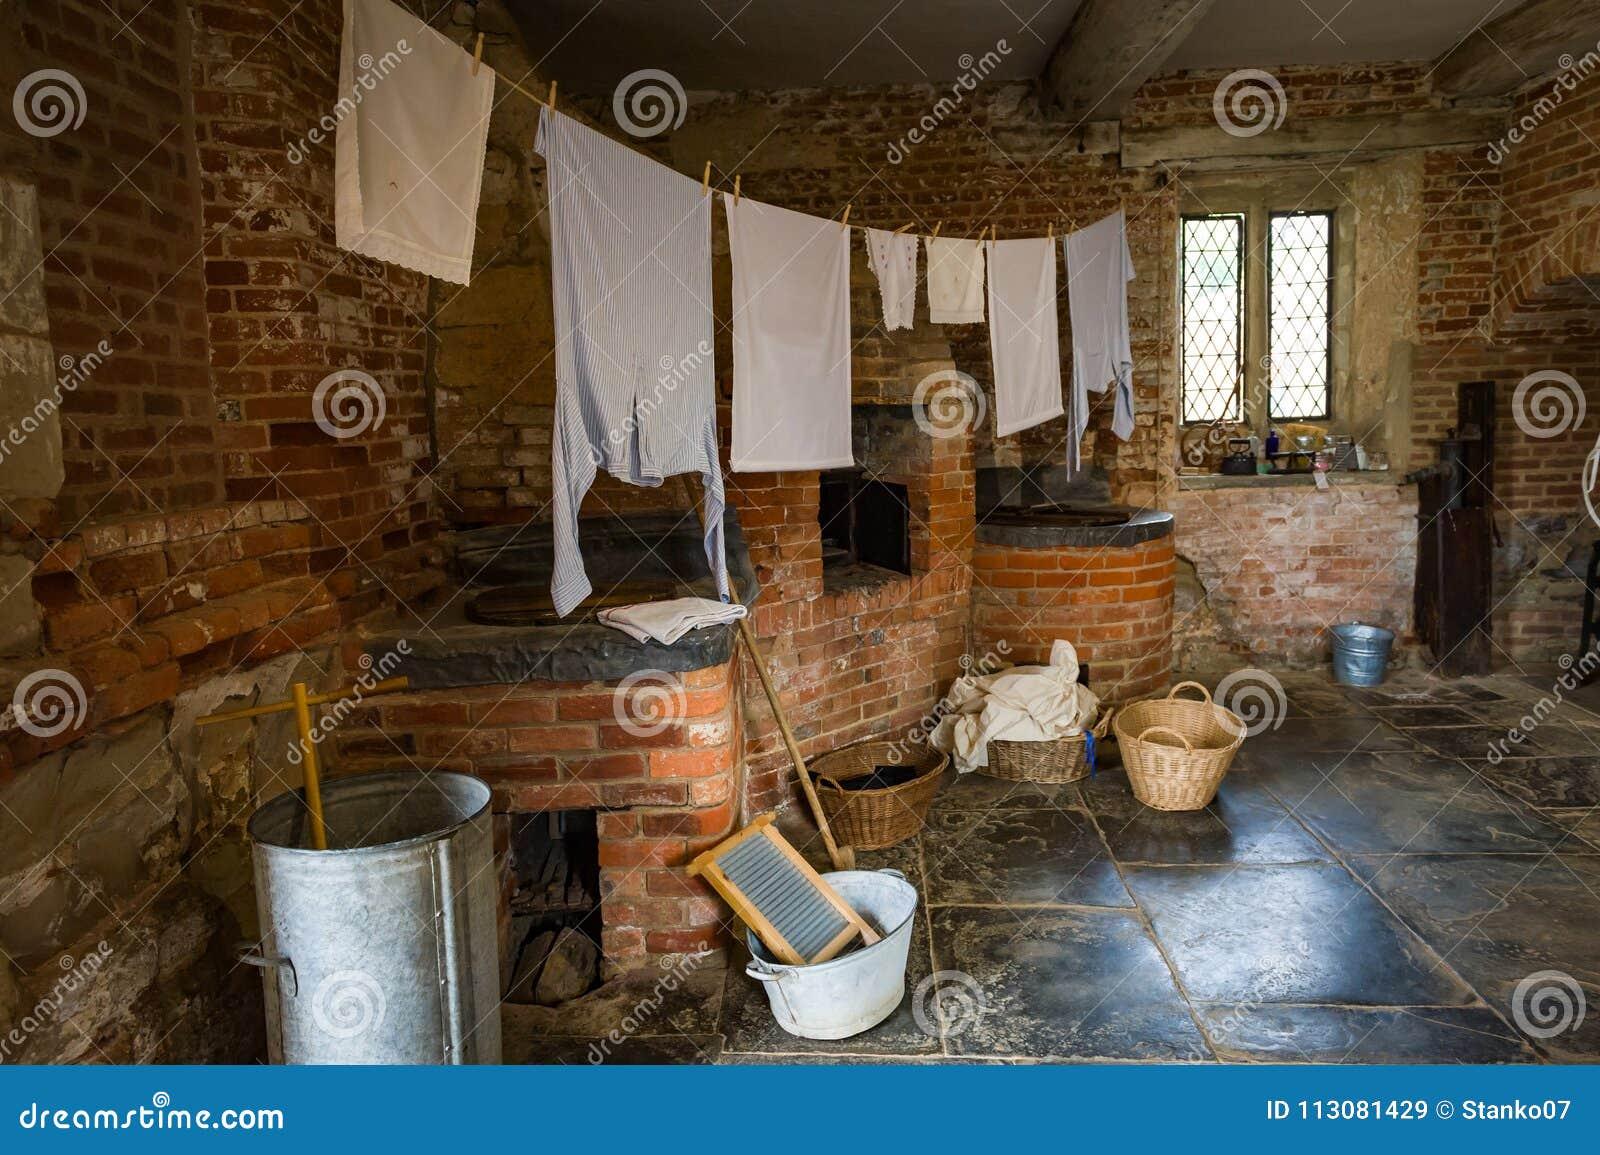 Lavandaria vitoriano com equipamento